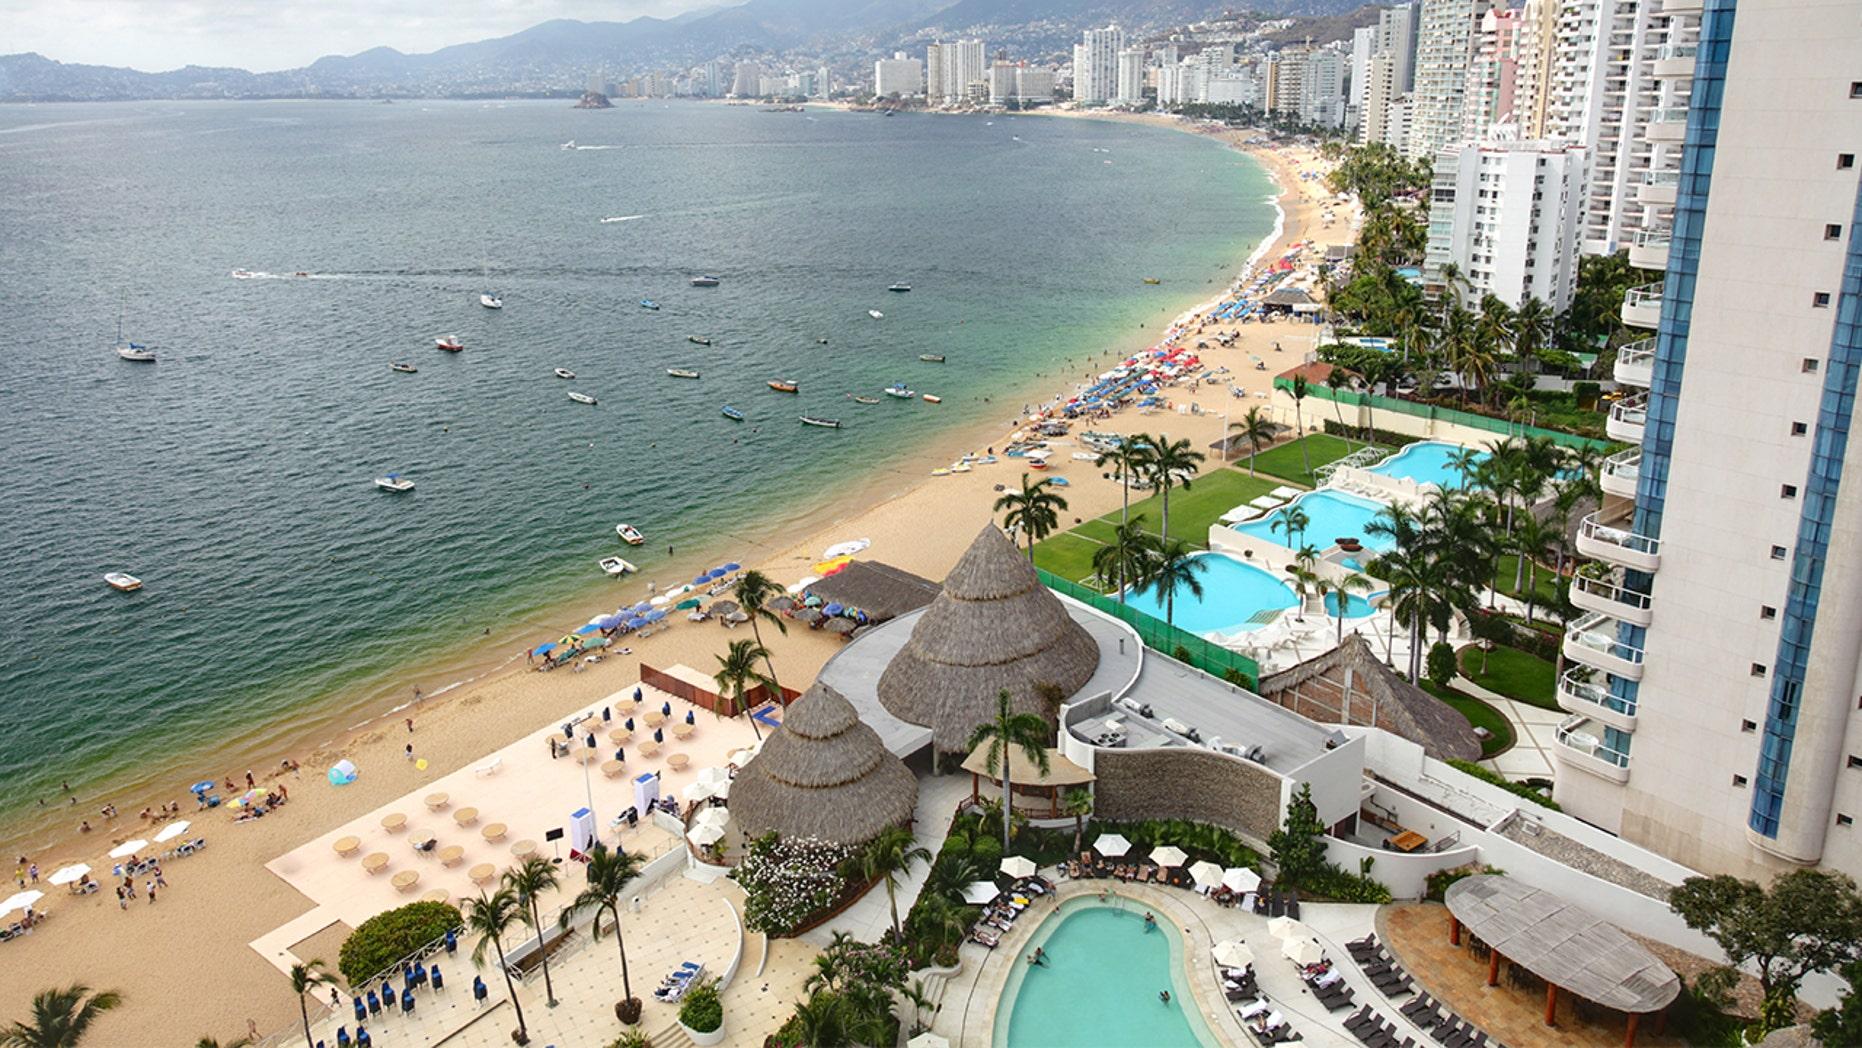 Acapulco Mexico S Murder Capital Sees Steady Tourism Despite